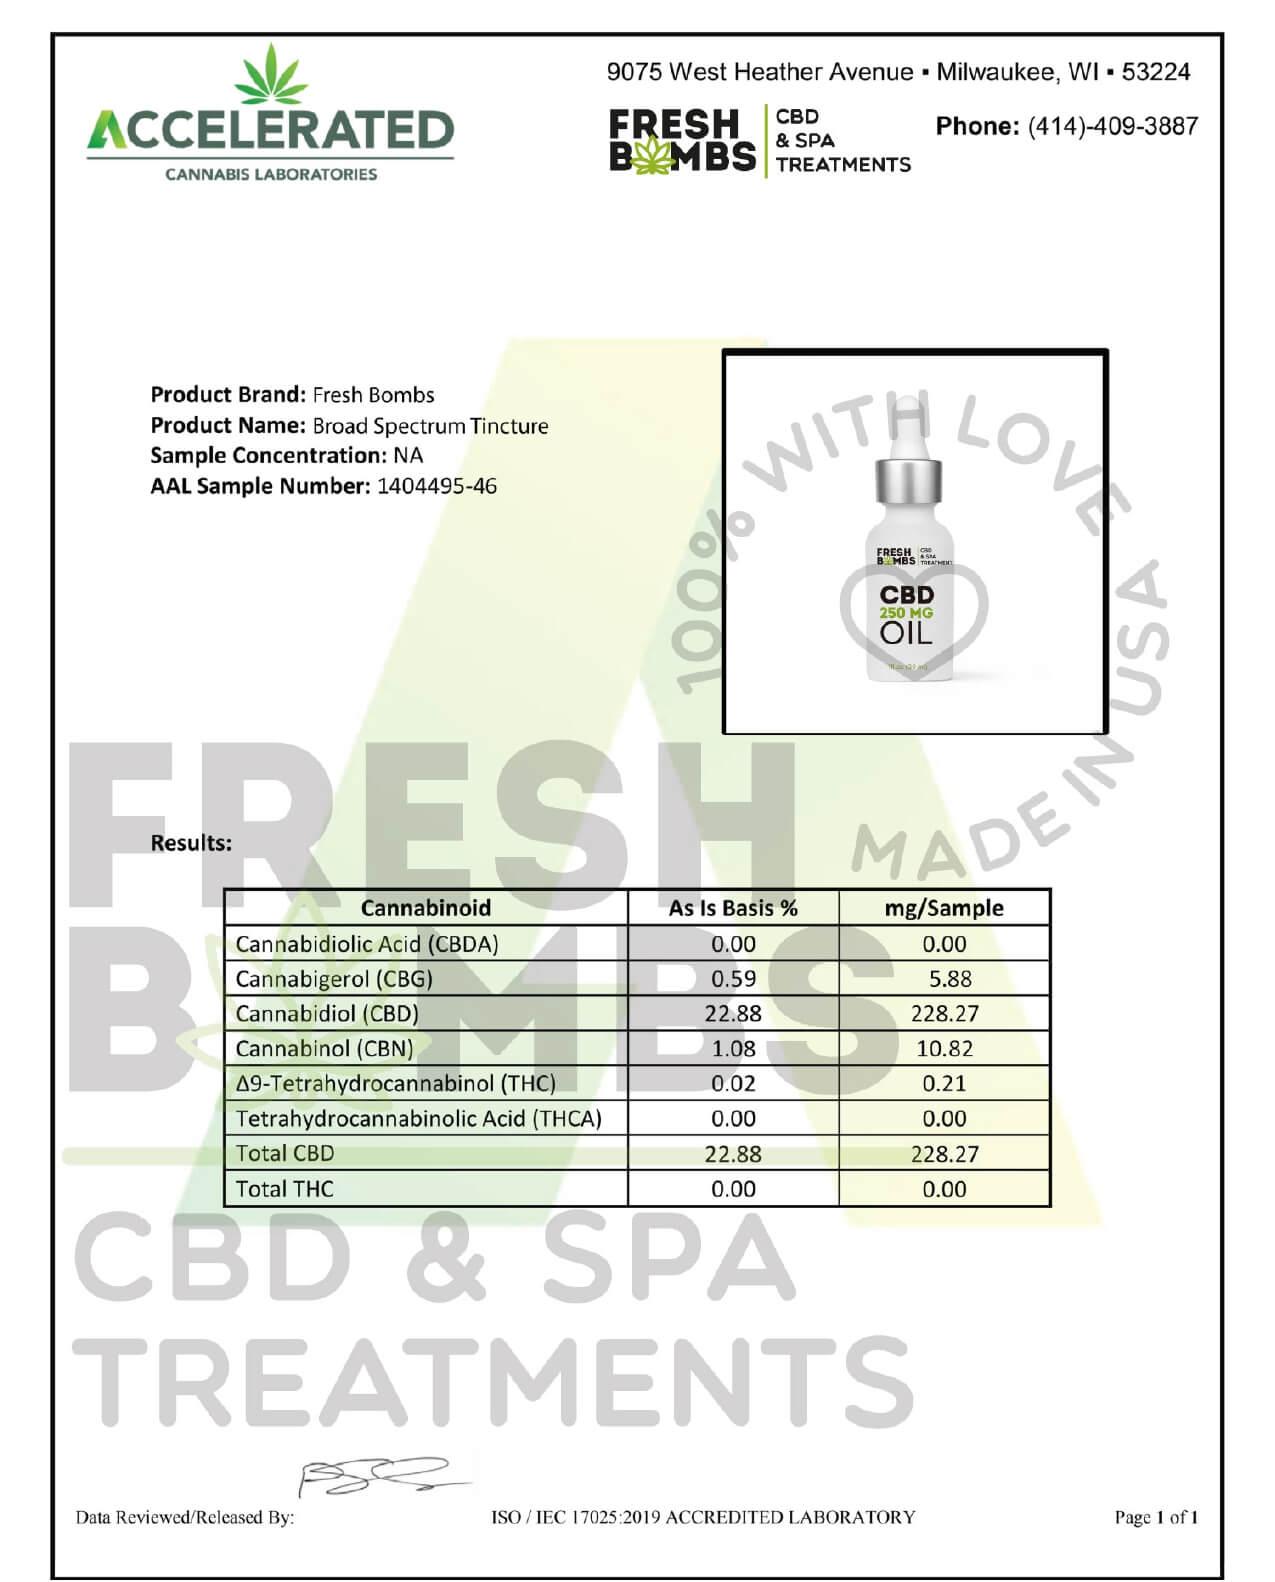 Fresh Bombs CBD Tincture Broad Spectrum Oil 250mg Lab Report